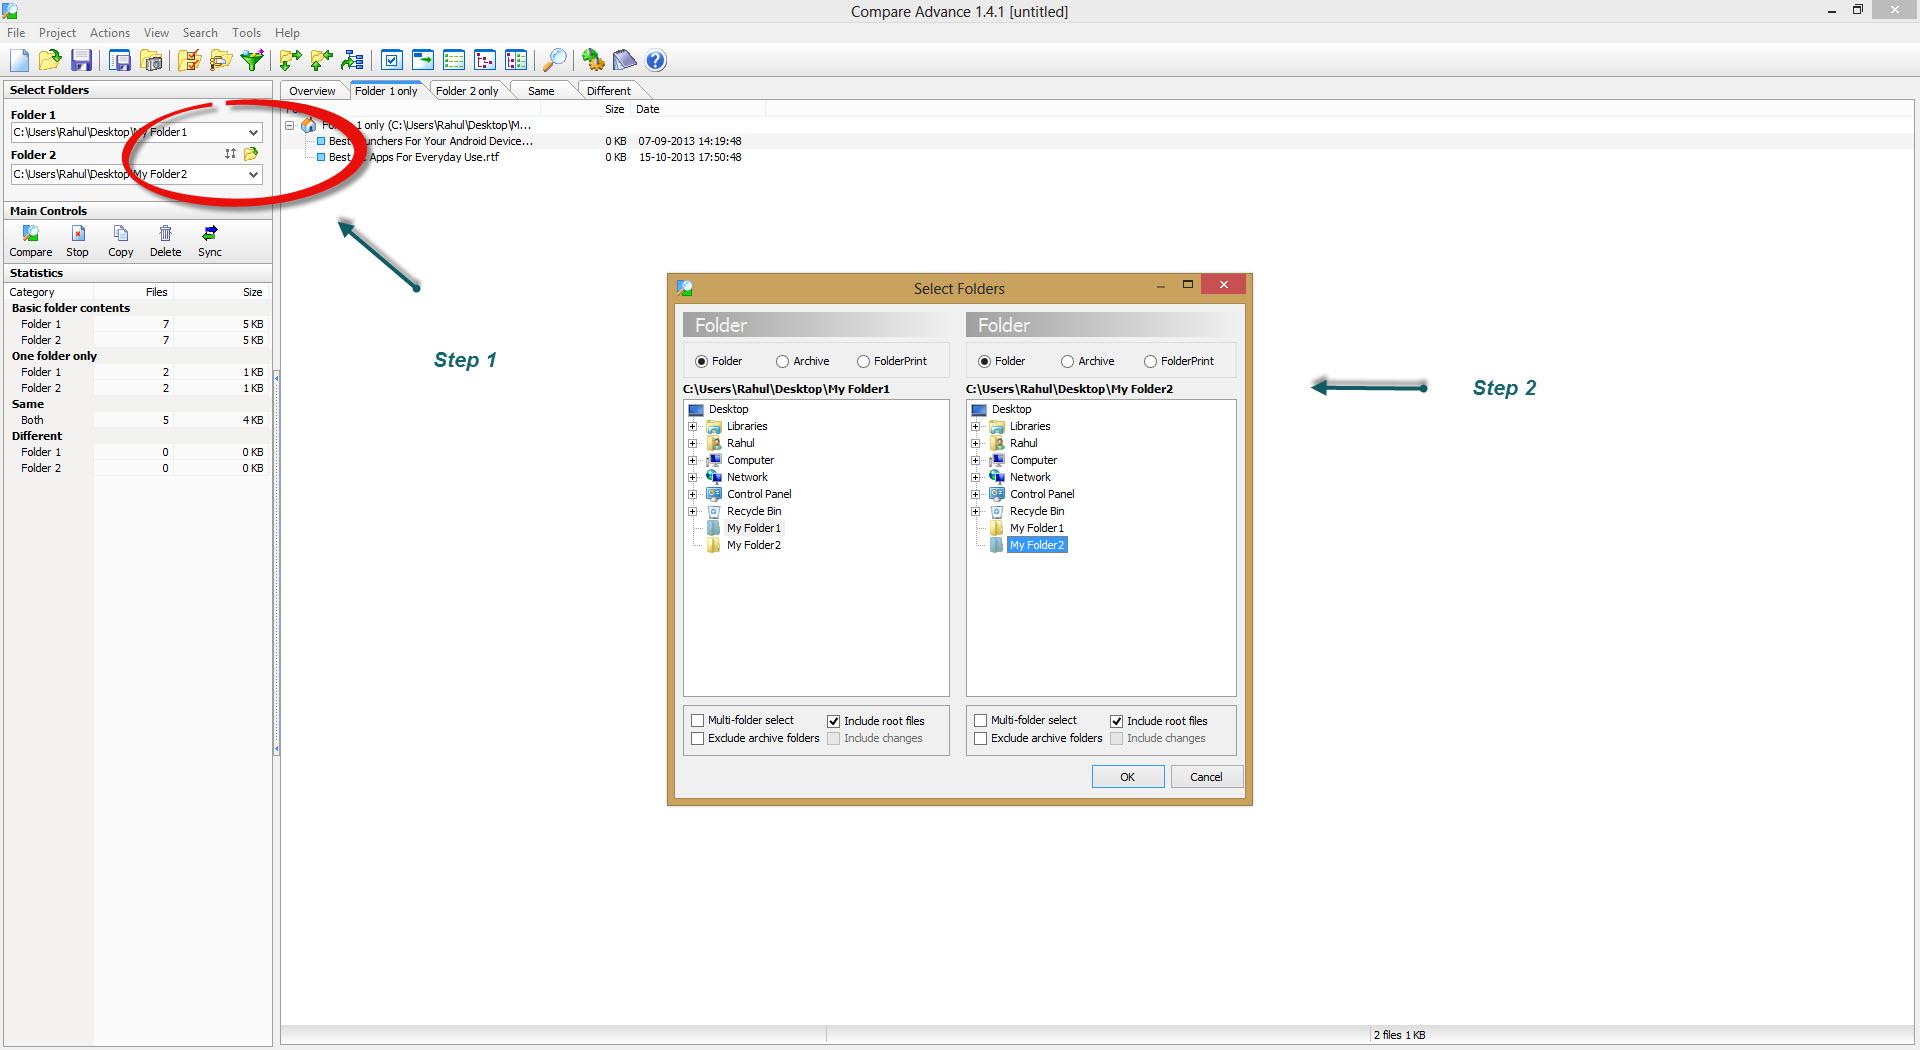 Selecting Folders